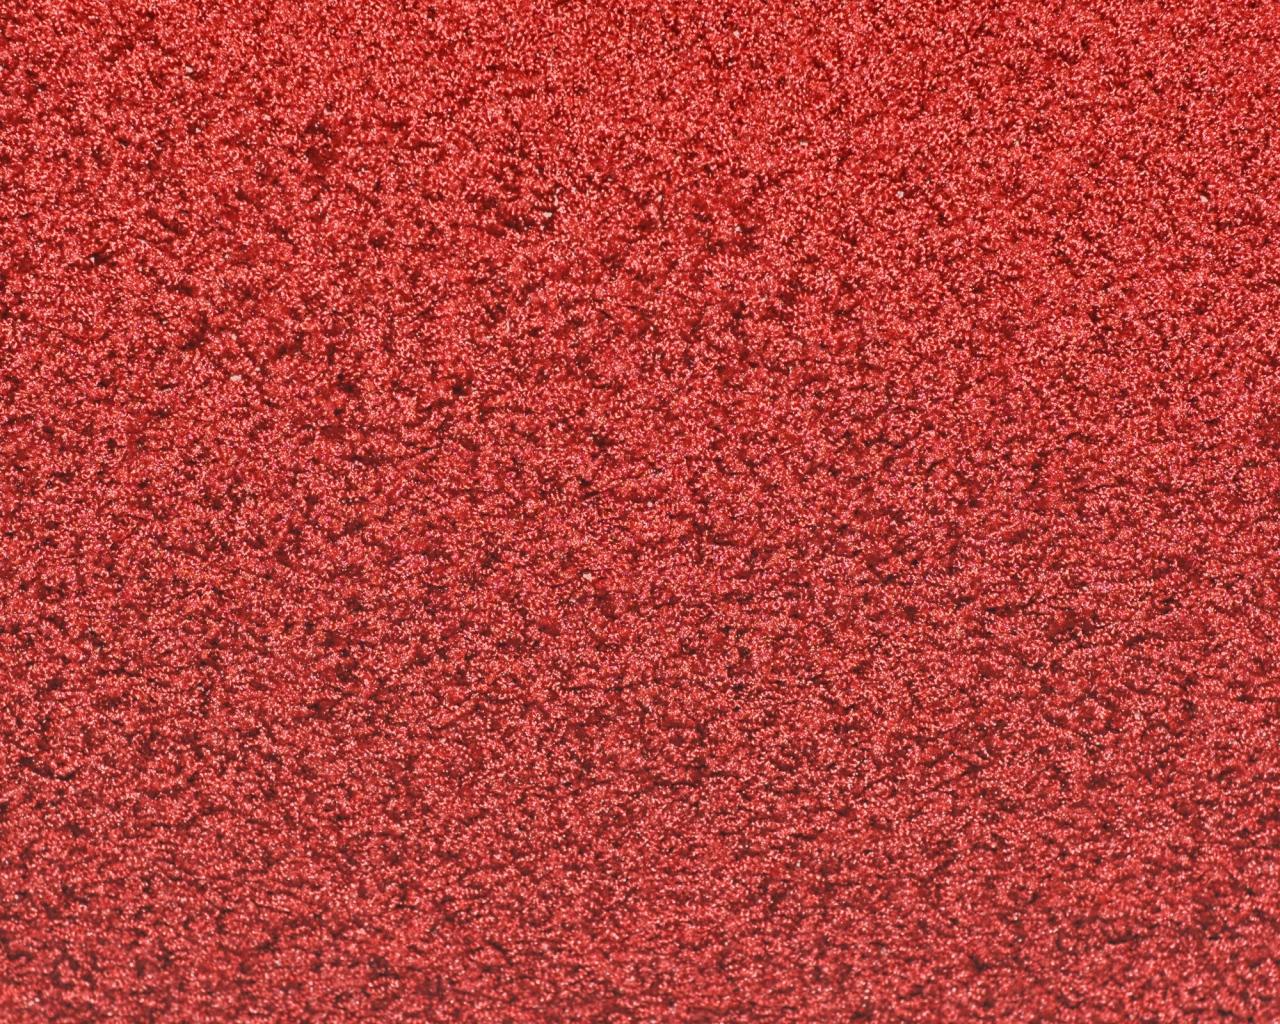 Tapete Brilhante fundo Textura 4K HD Wallpaper 1280x1024 1280x1024